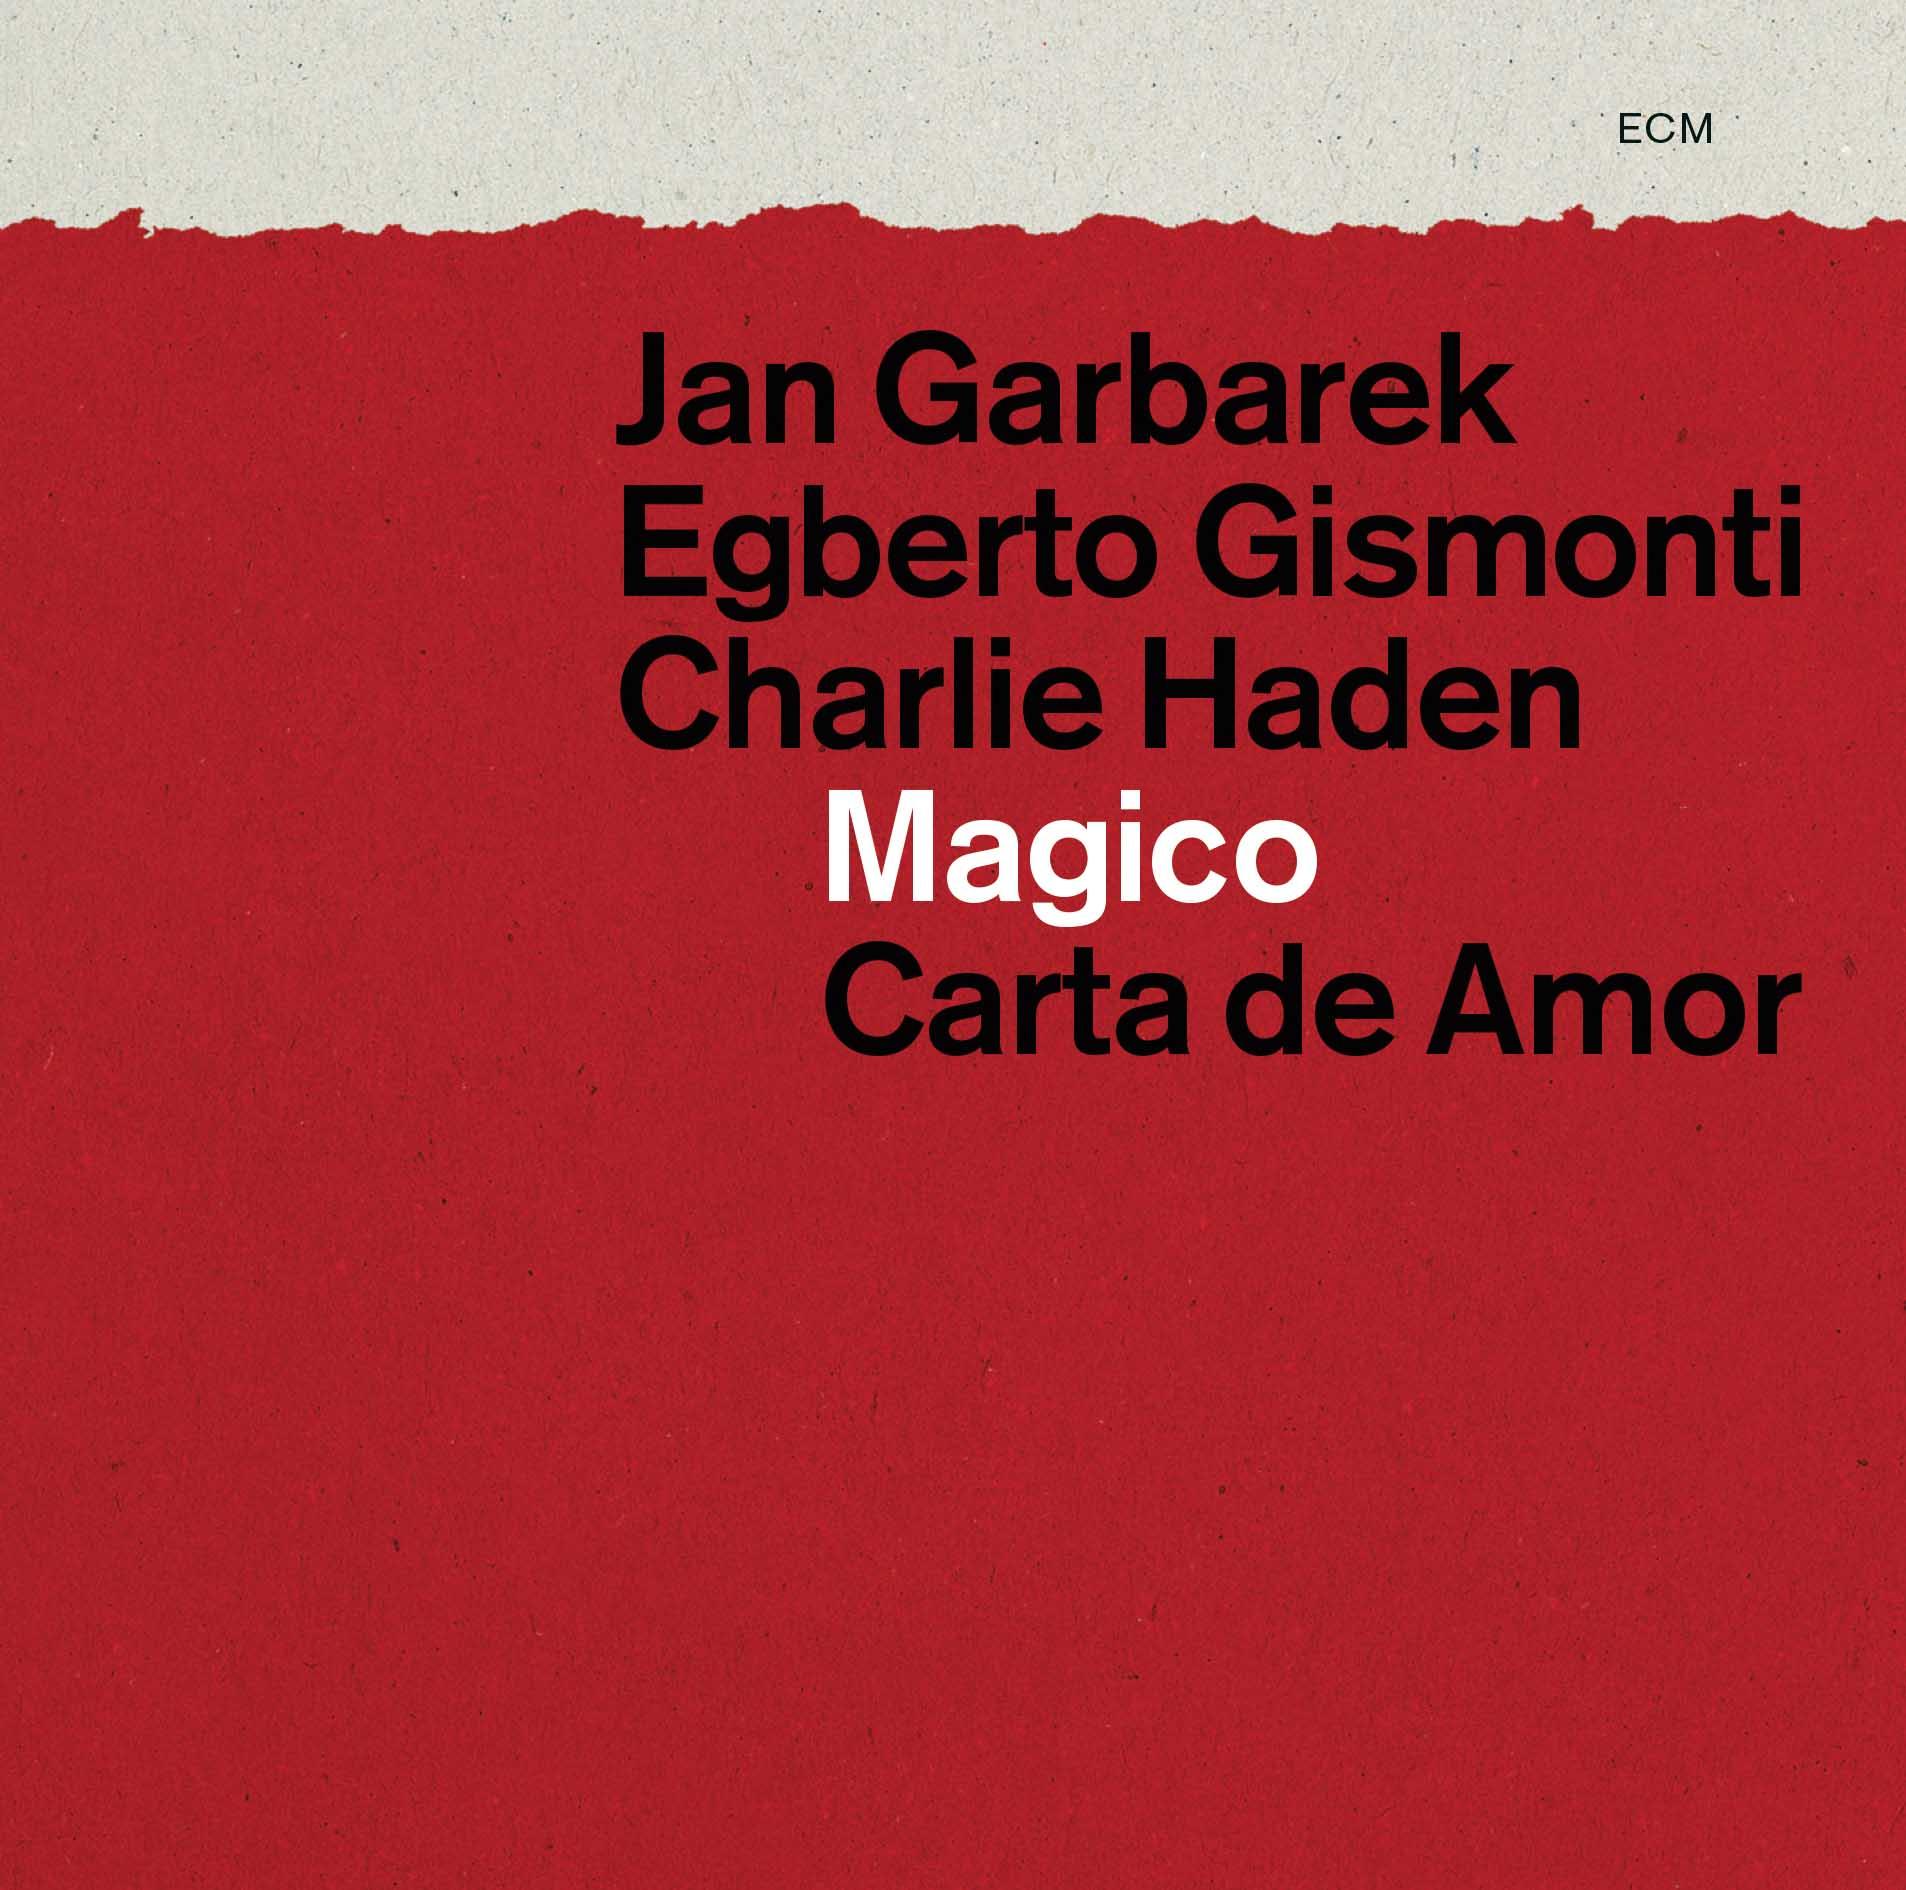 ECM records Magico 1